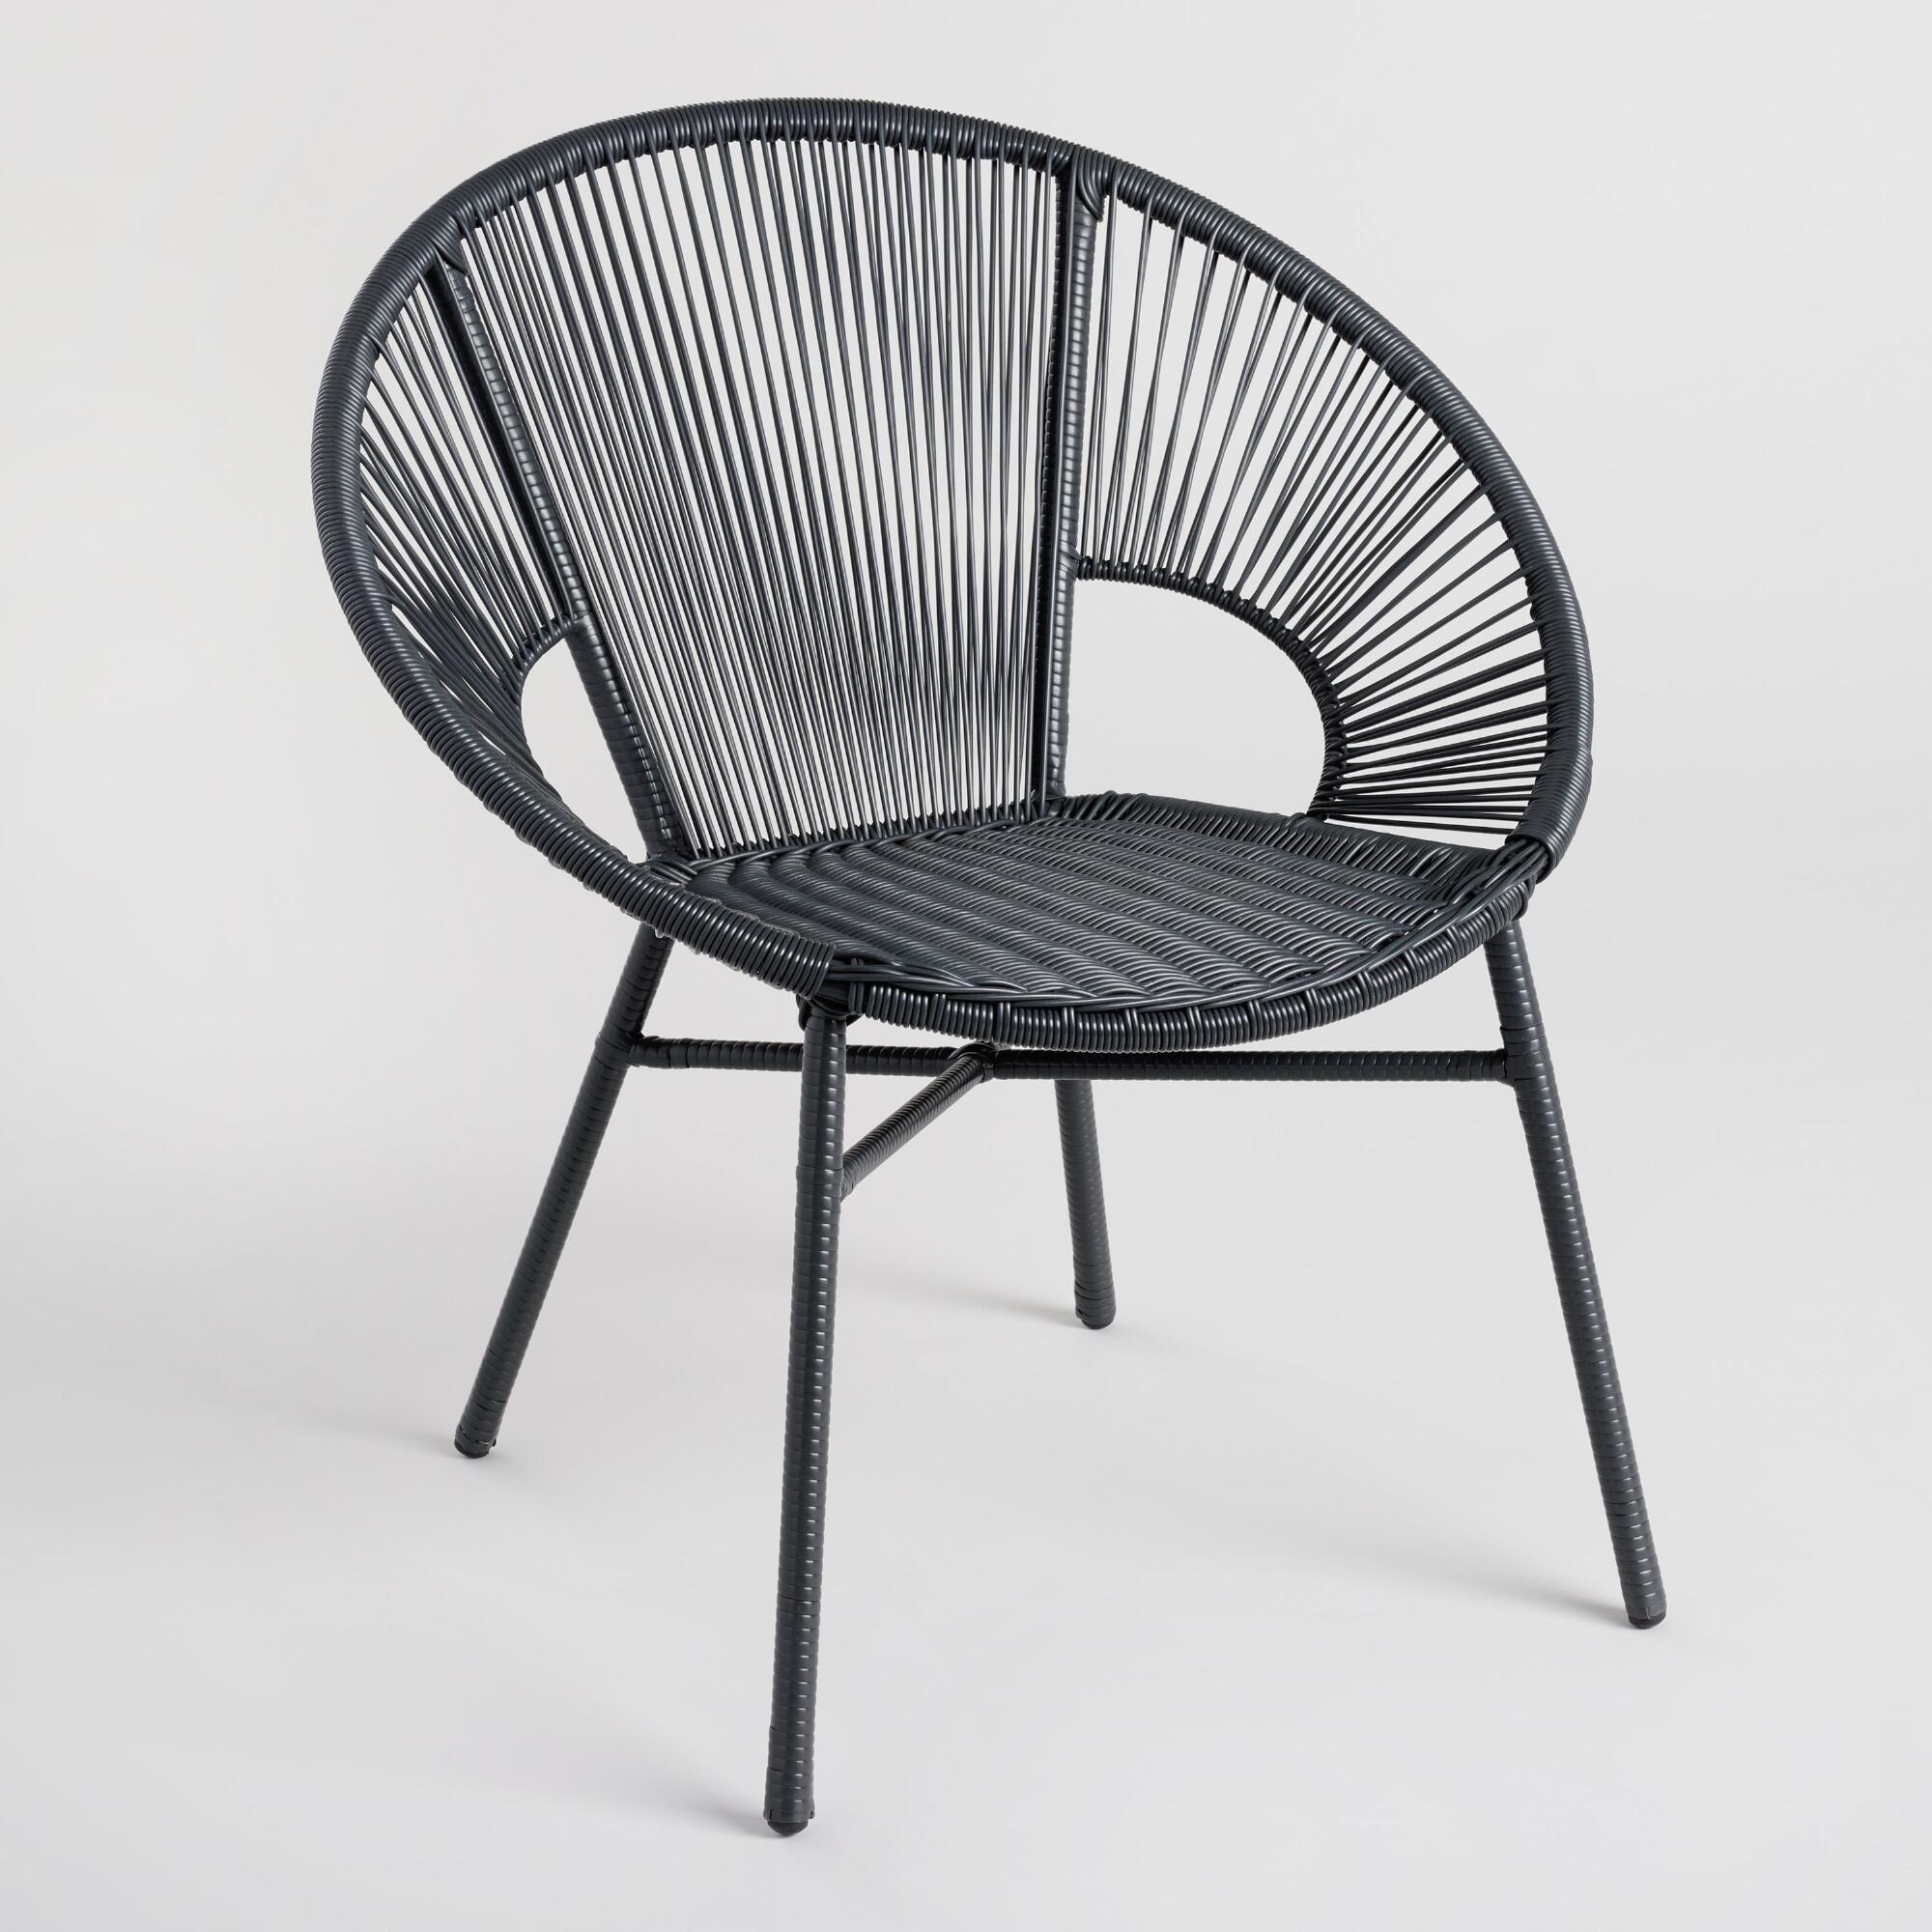 Sensational Round Black All Weather Wicker Camden Outdoor Patio Chair By Machost Co Dining Chair Design Ideas Machostcouk